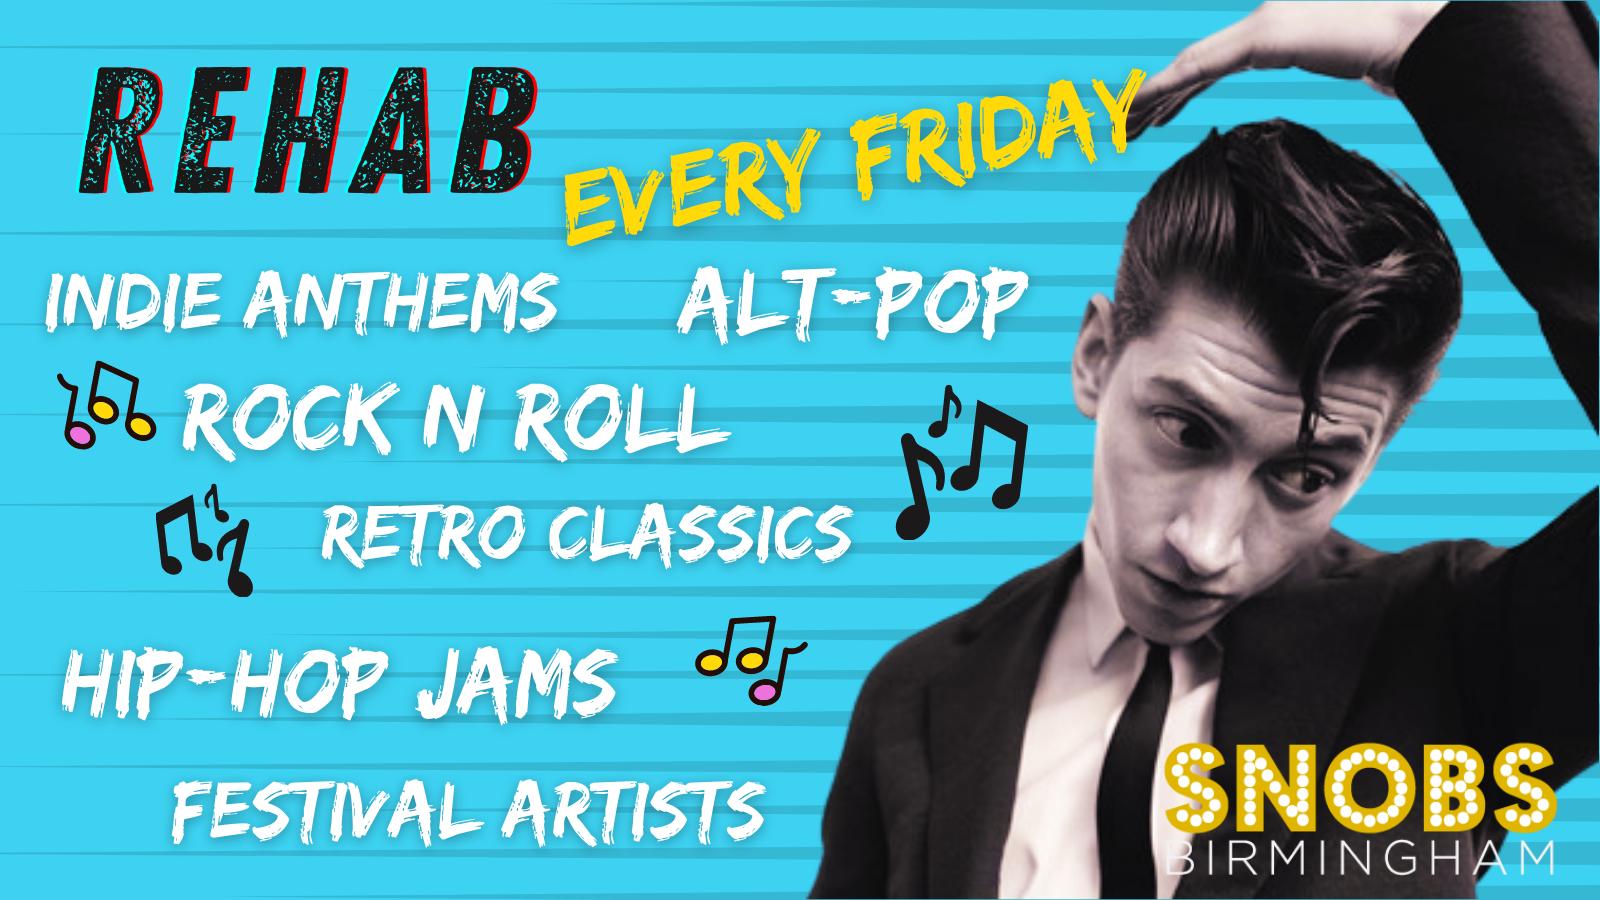 Rehab vs Bad Habits Friday 15th October